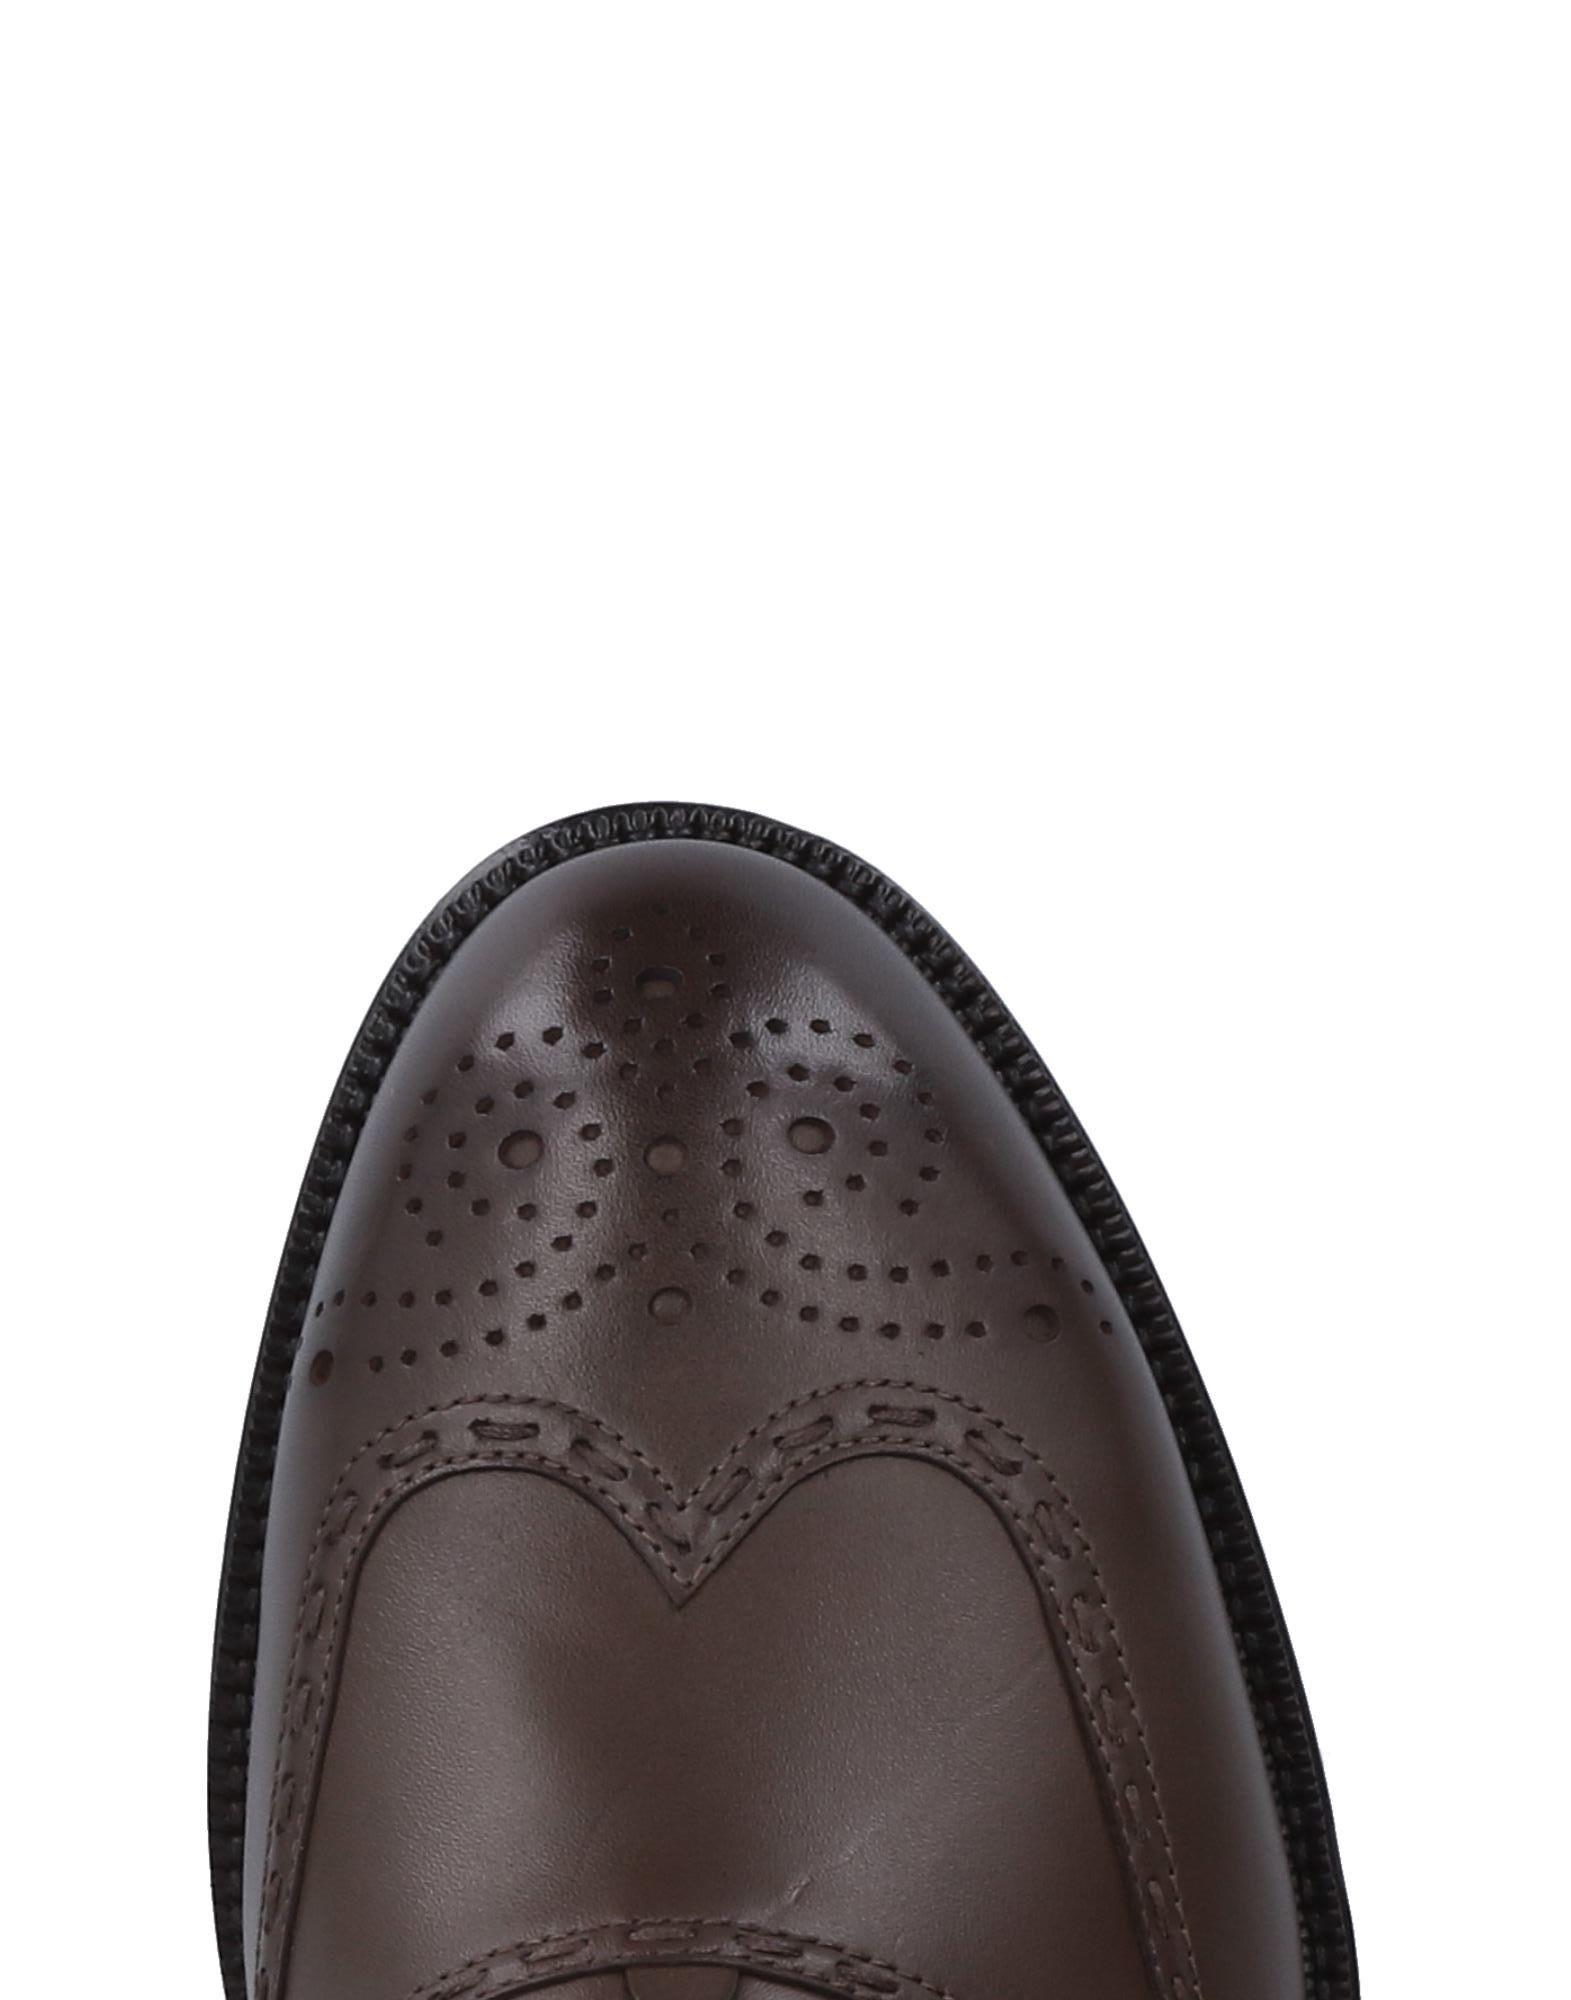 Bottega 11106285OD Veneta Schnürschuhe Herren  11106285OD Bottega Gute Qualität beliebte Schuhe 2a79a0